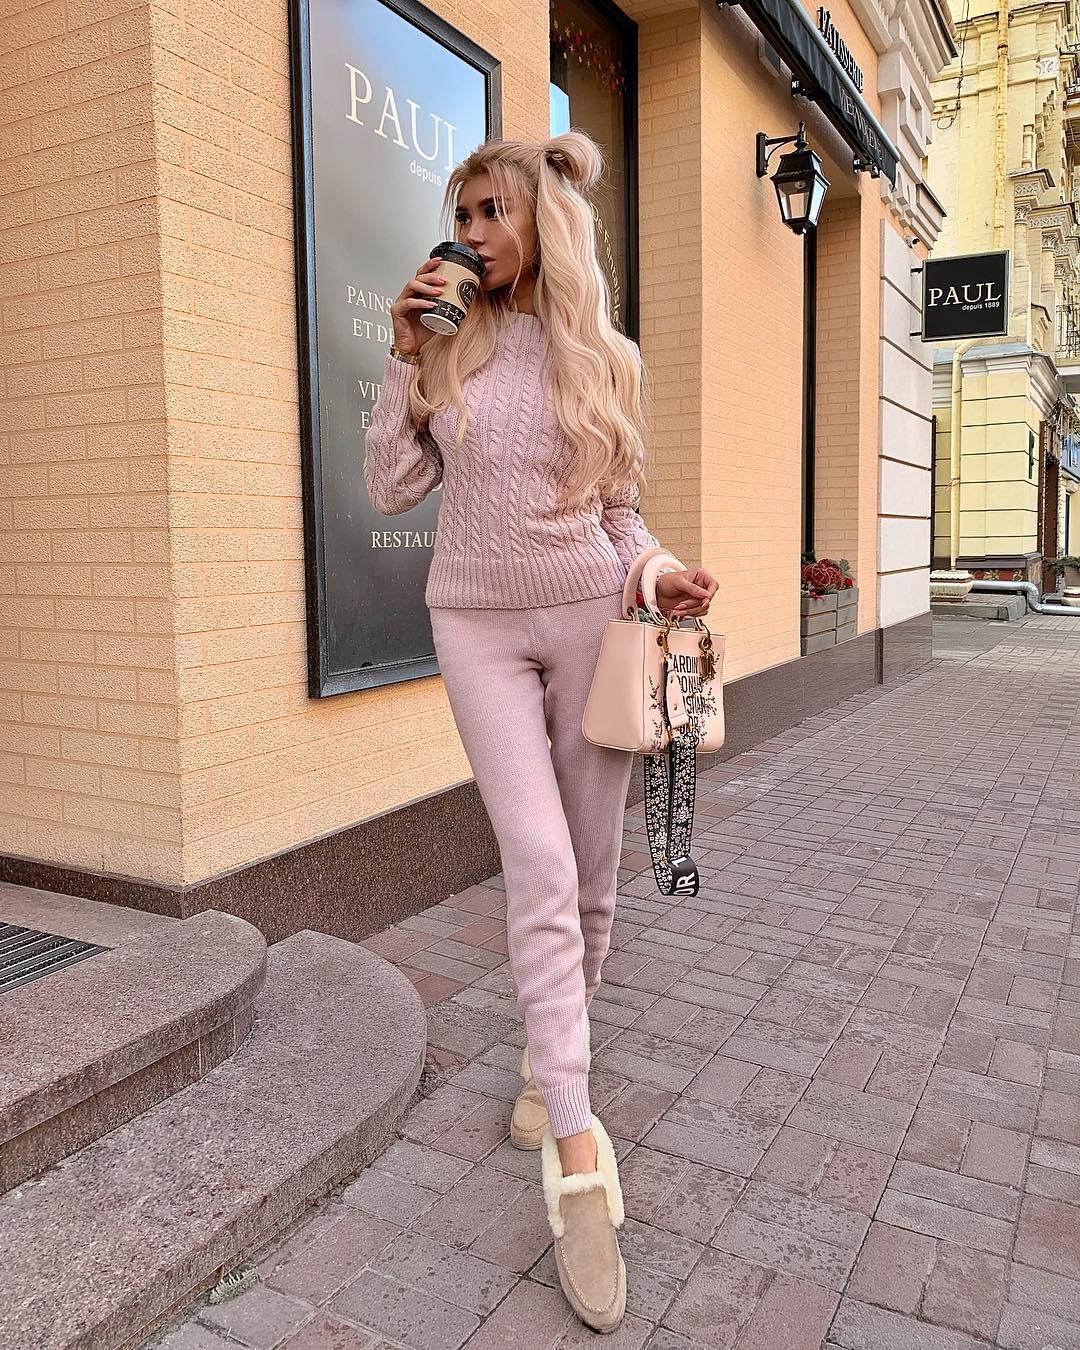 Milevskate-Wallpapers-Insta-Fit-Bio-3